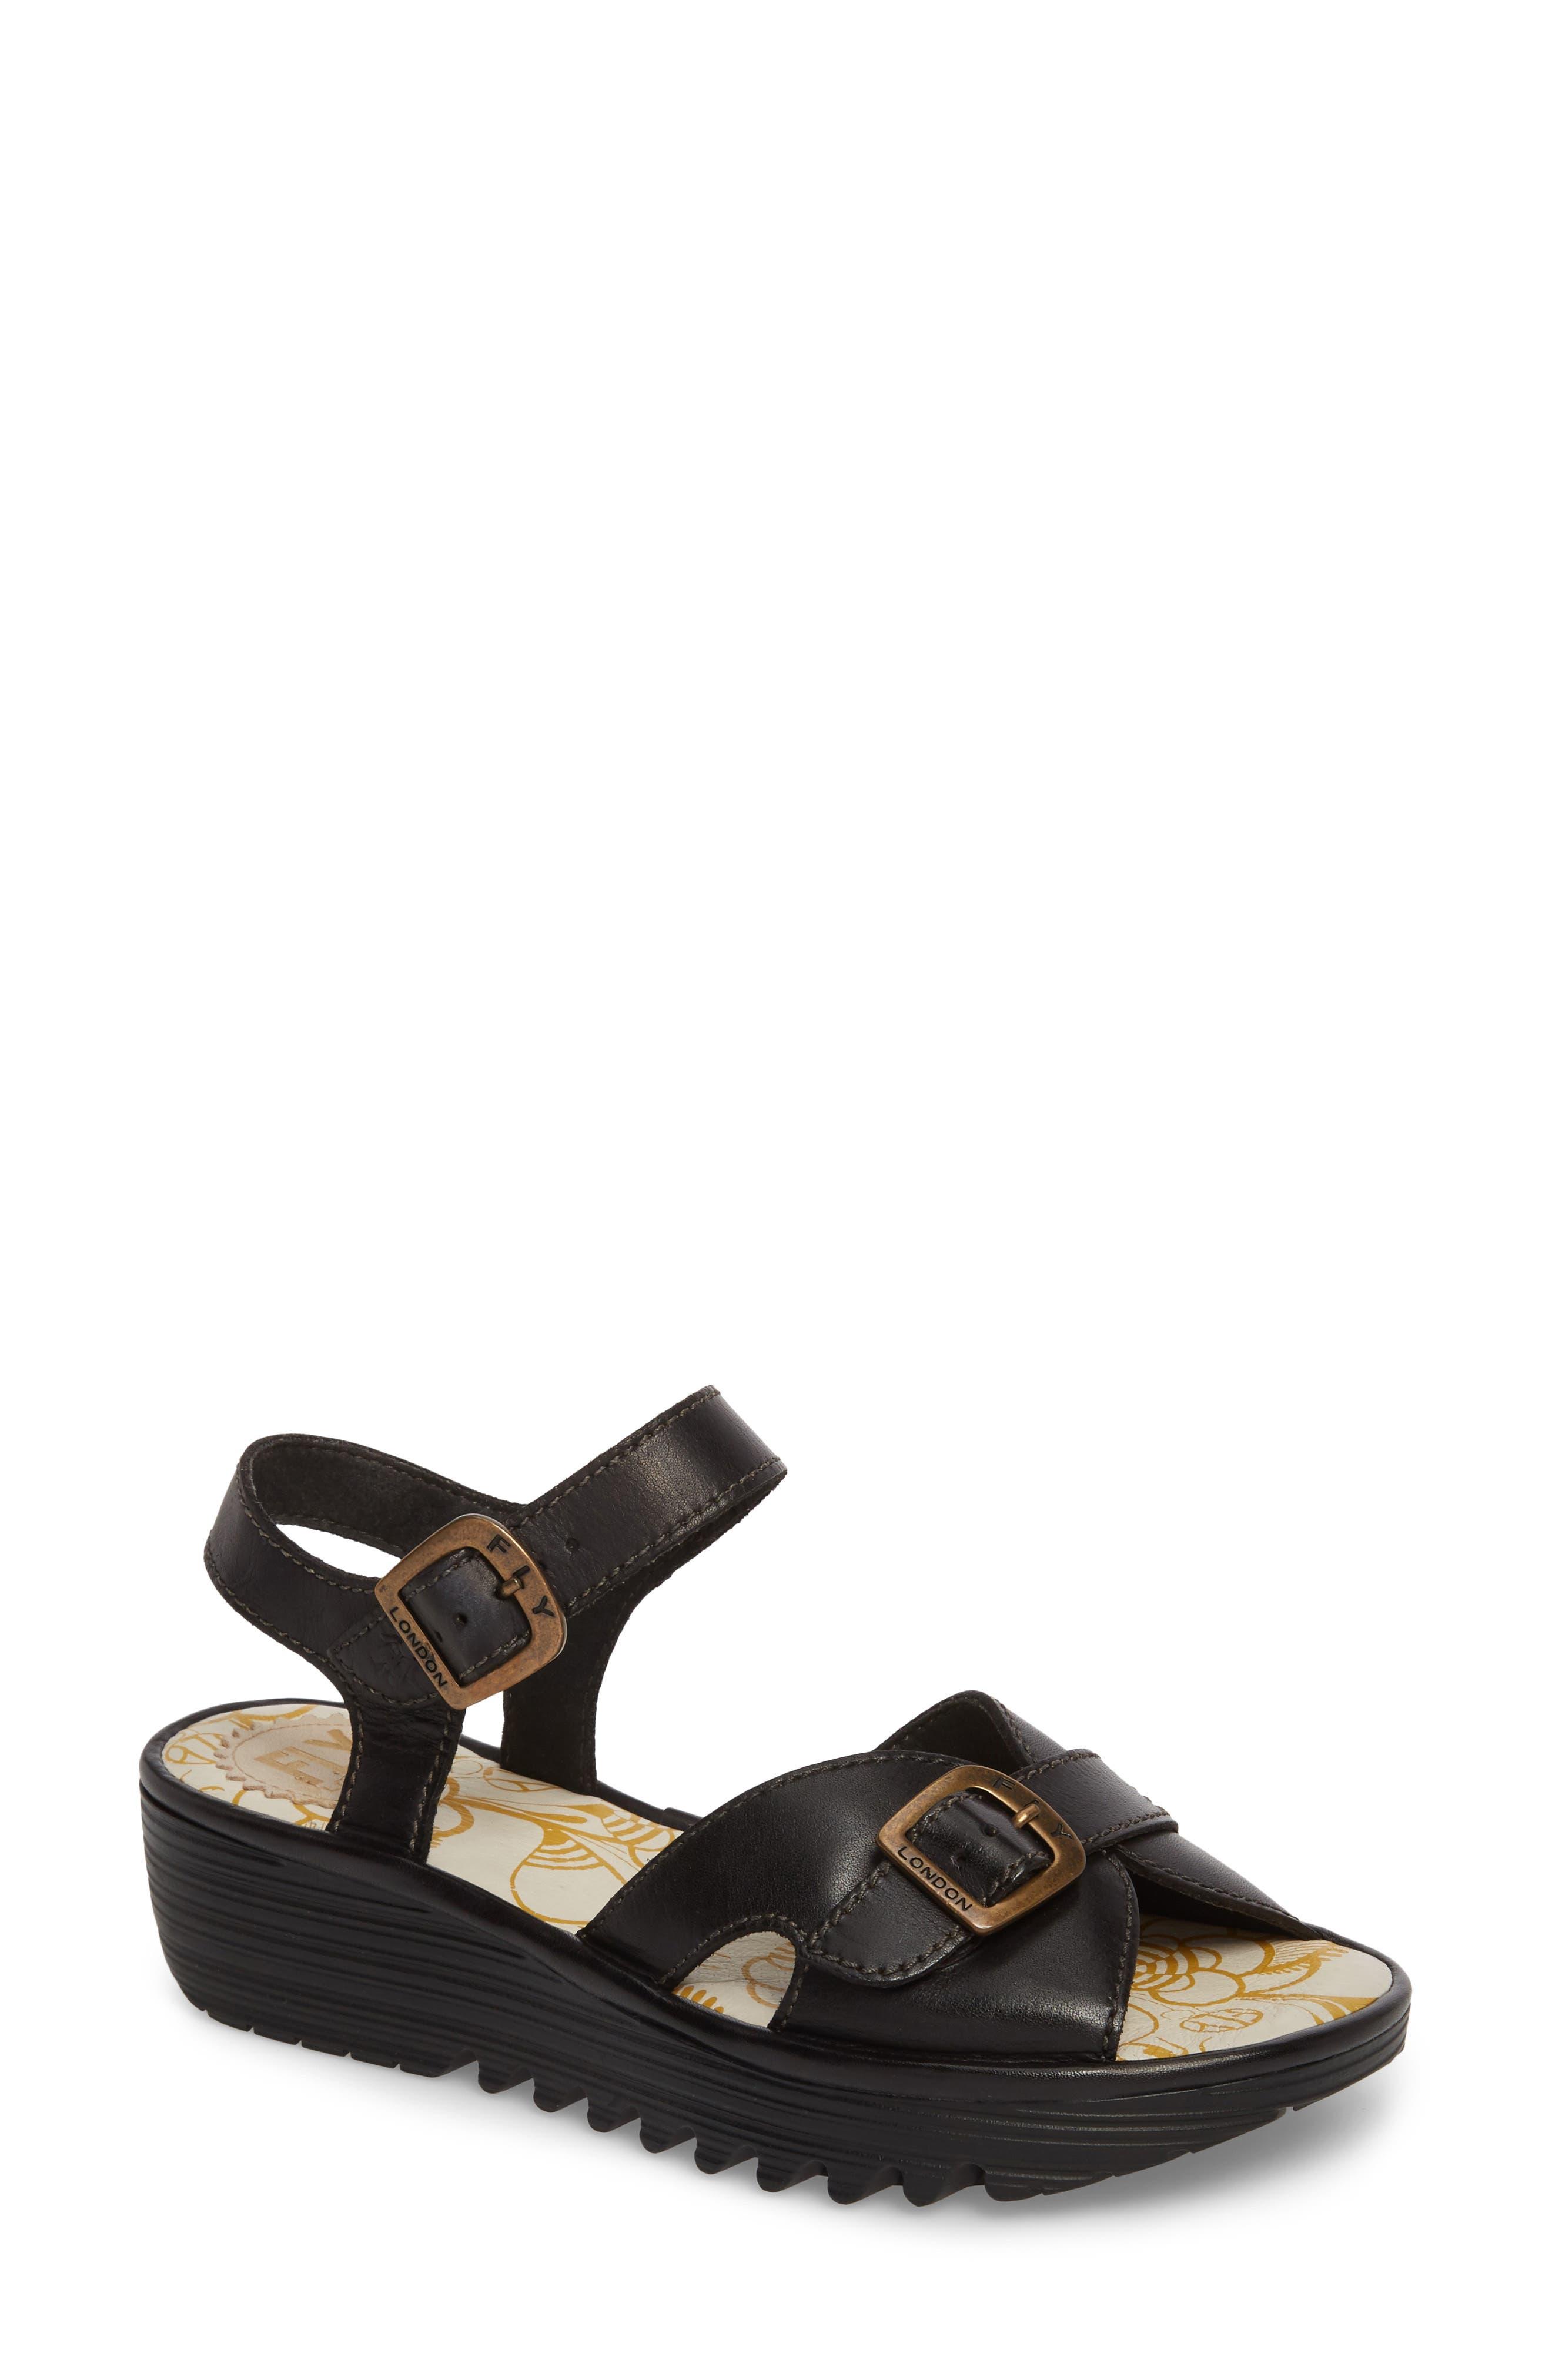 Egal Sandal,                         Main,                         color, BLACK COLMAR LEATHER